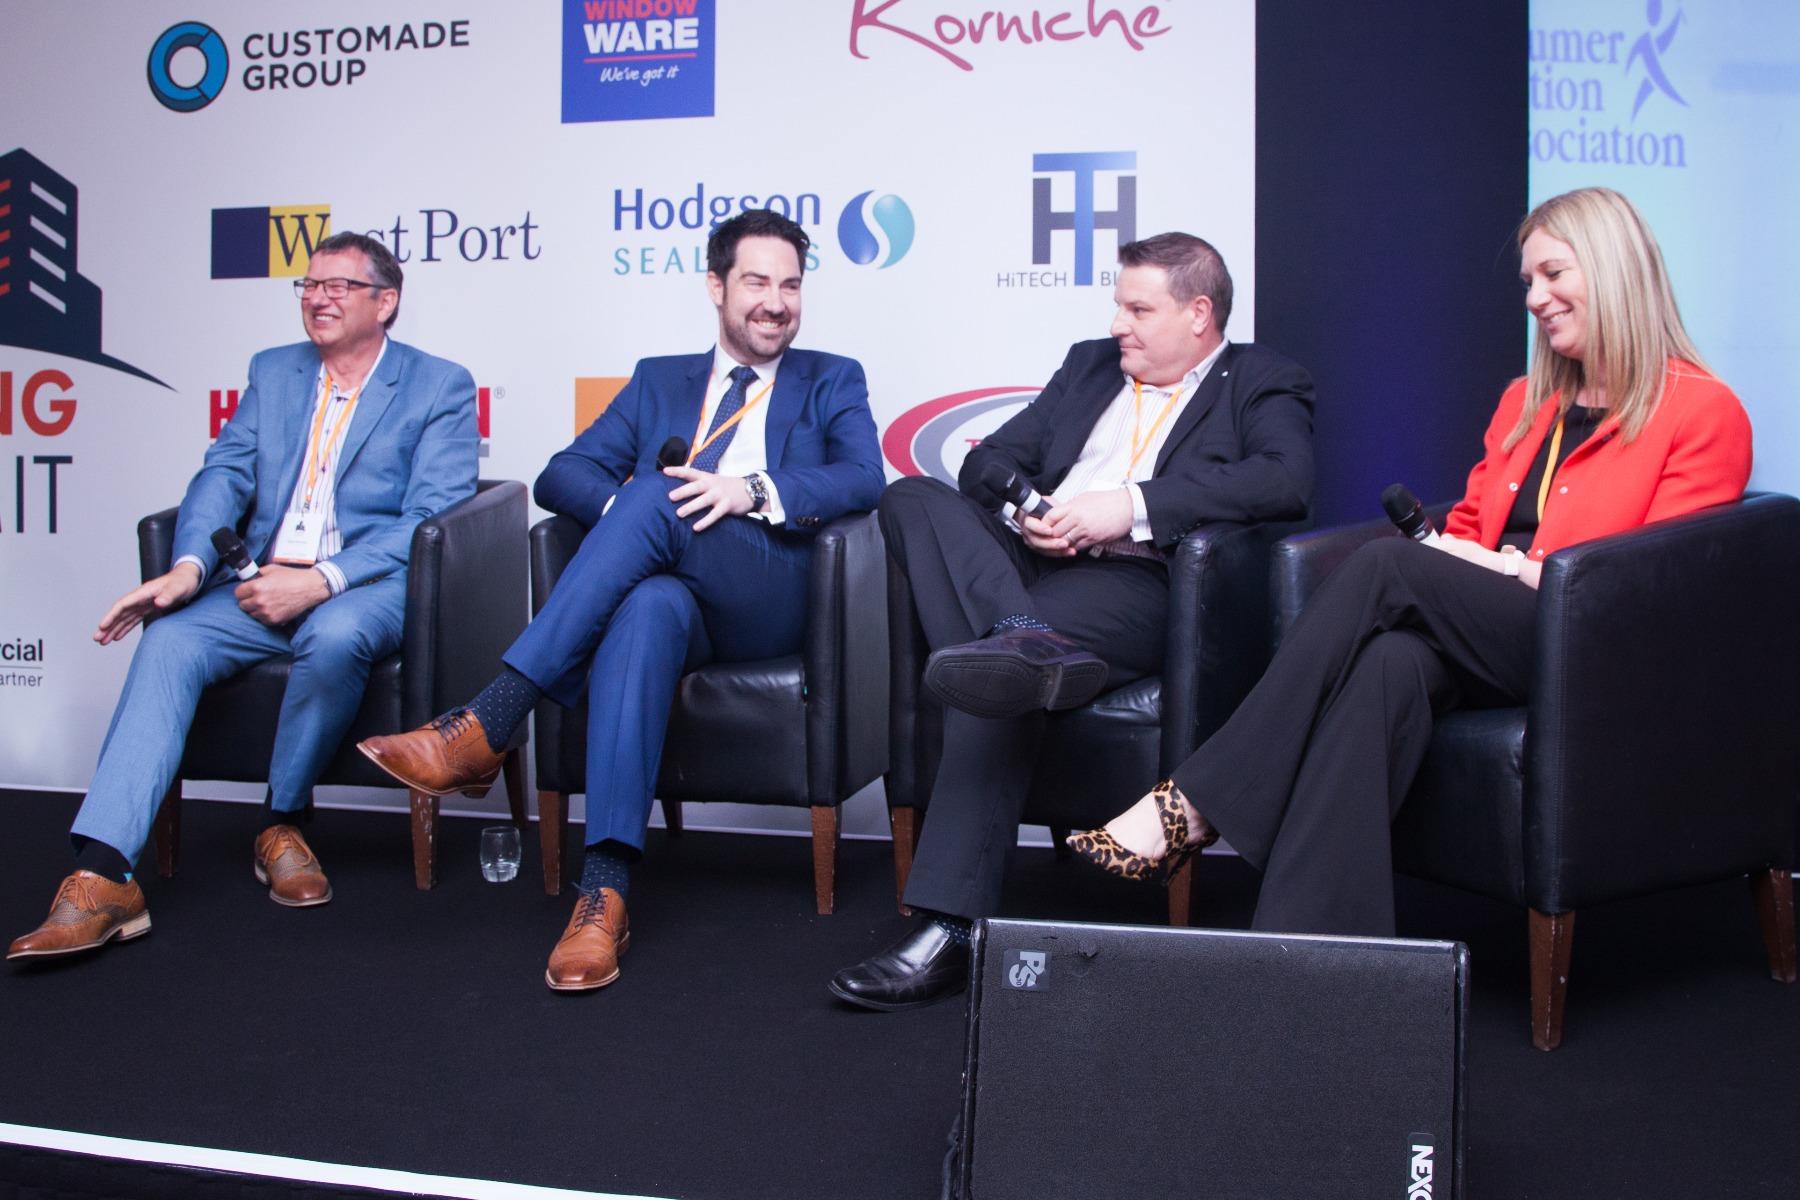 Sam Nuckey at the Glazing Summit 2019